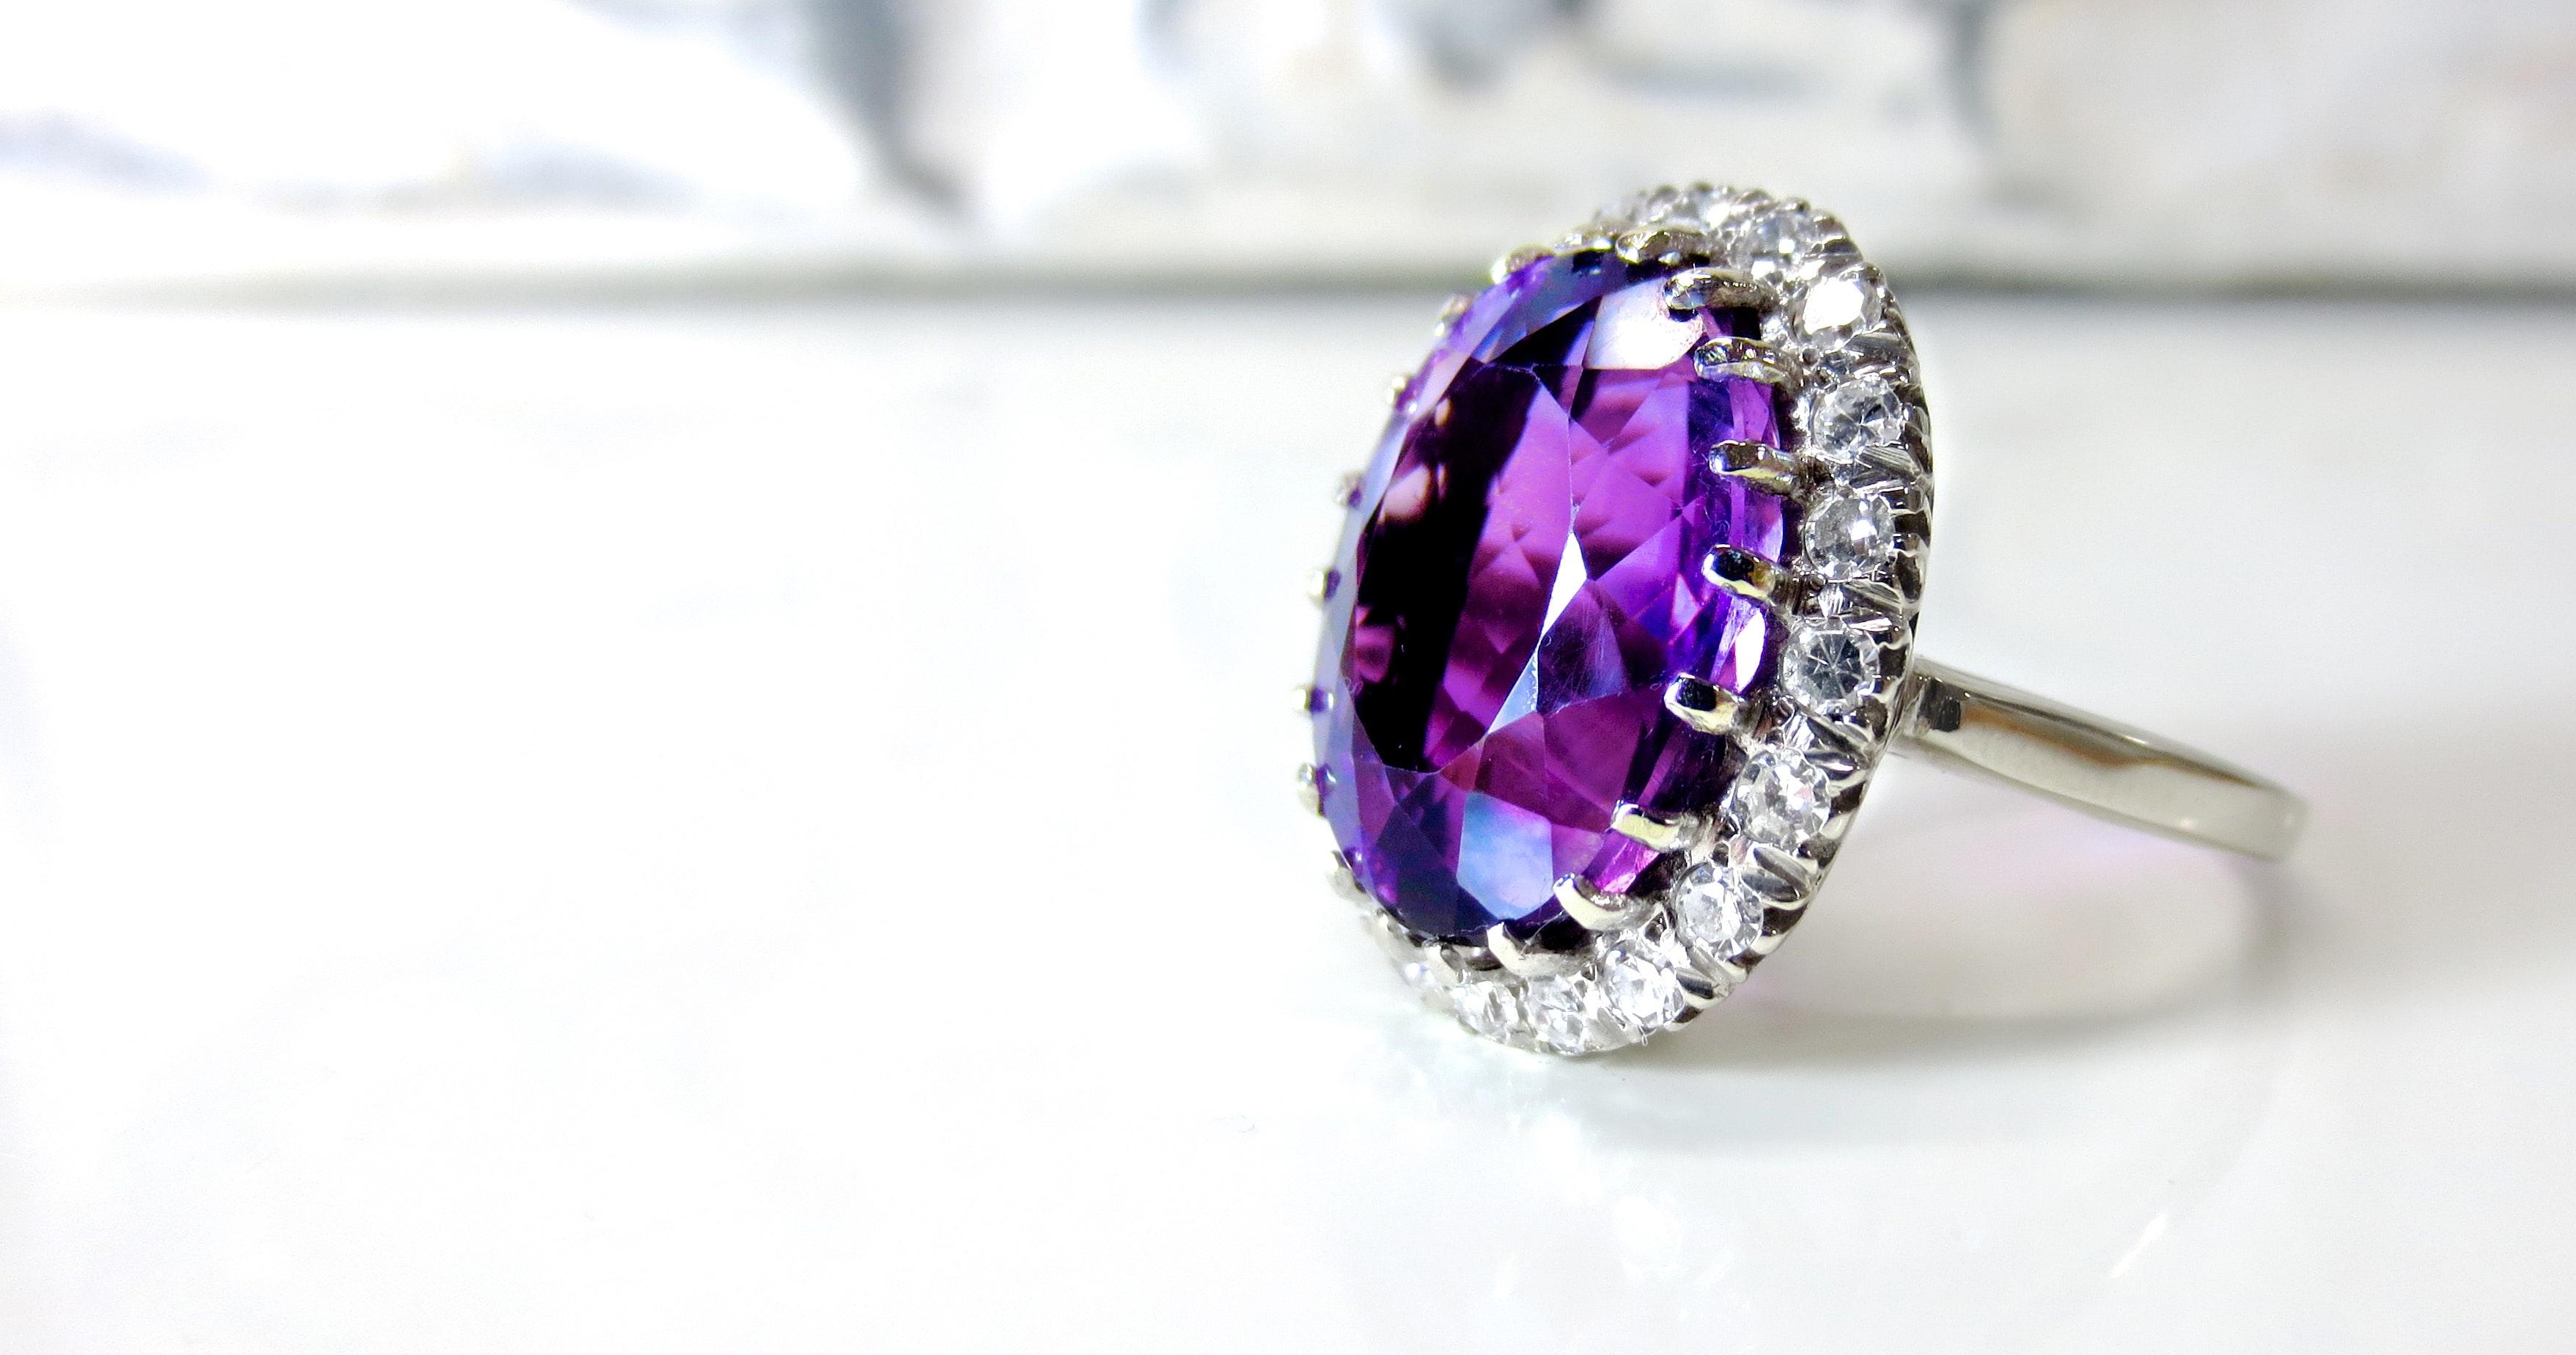 Amethyst Valentine Jewelry Gifts